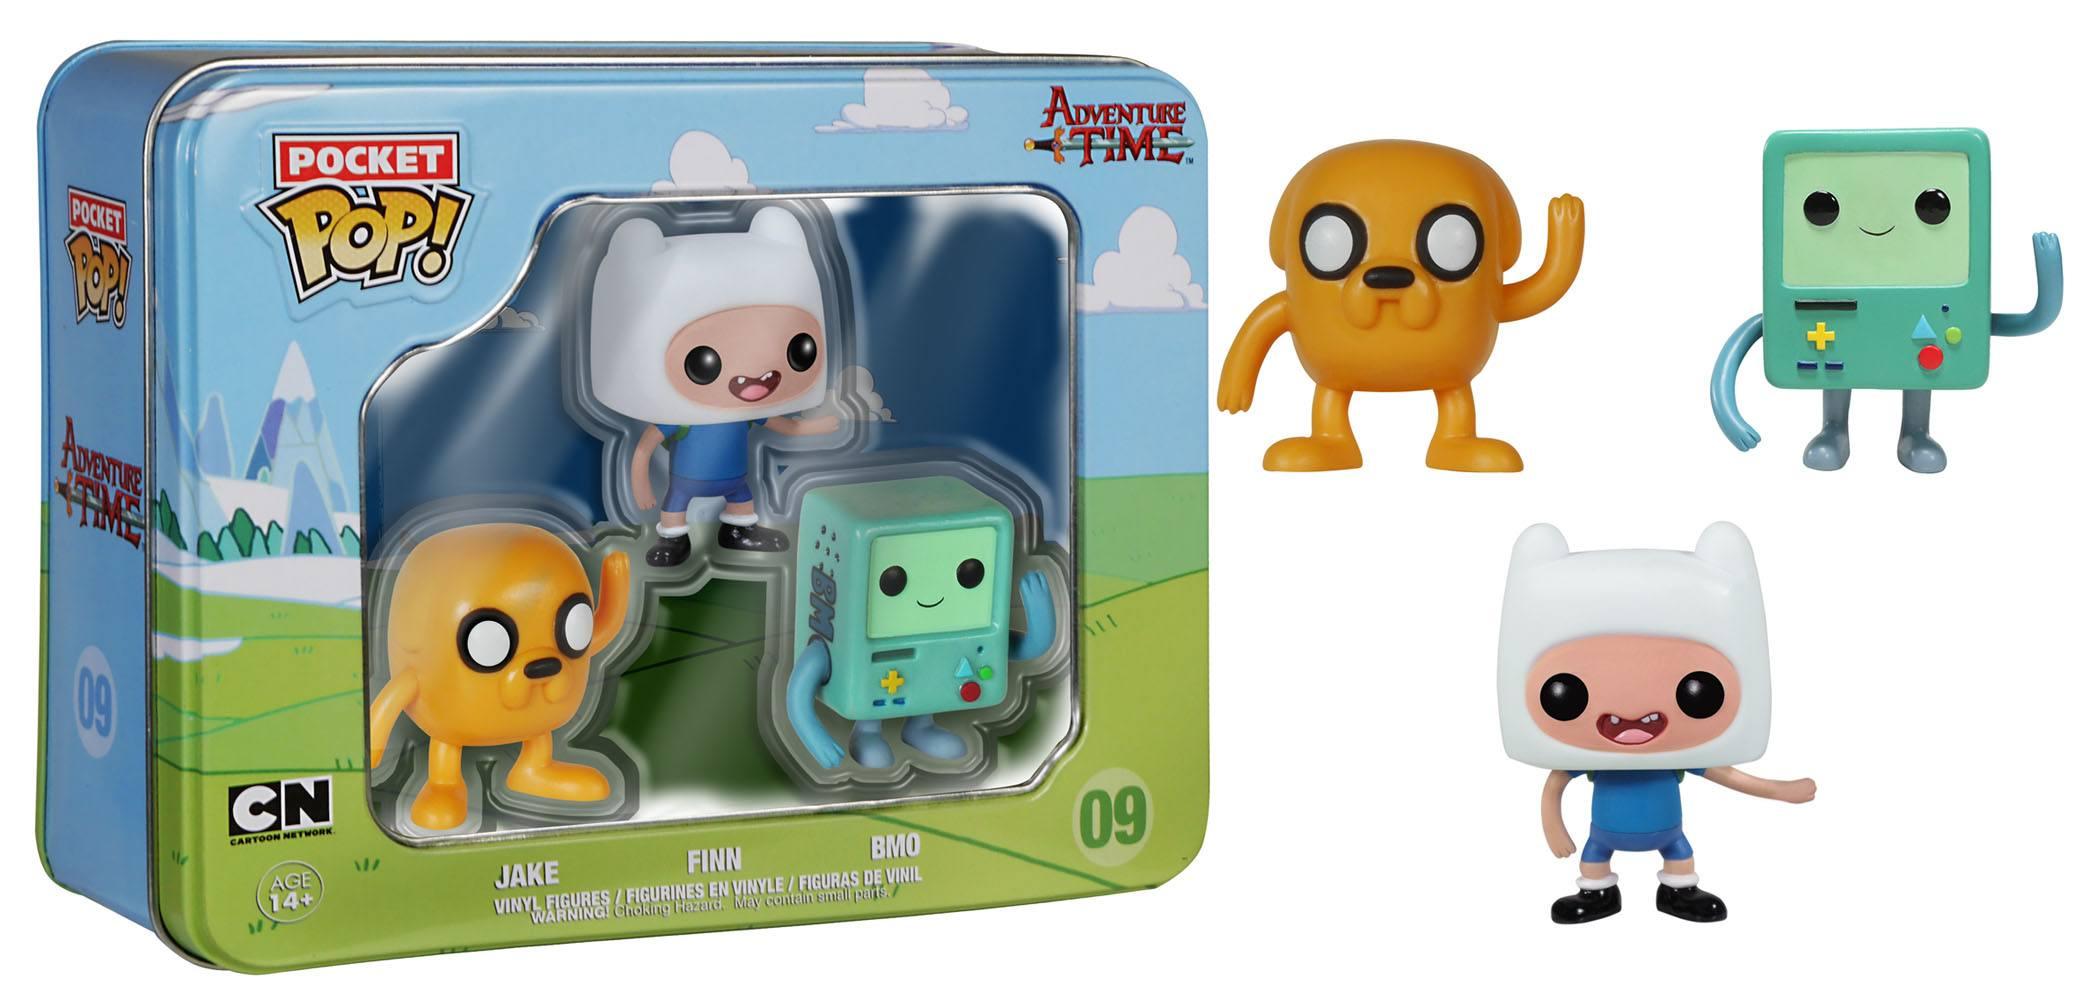 Adventure Time Pocket POP! Vinyl Figure 3-Pack Tin Finn, Jake, BMO 4 cm